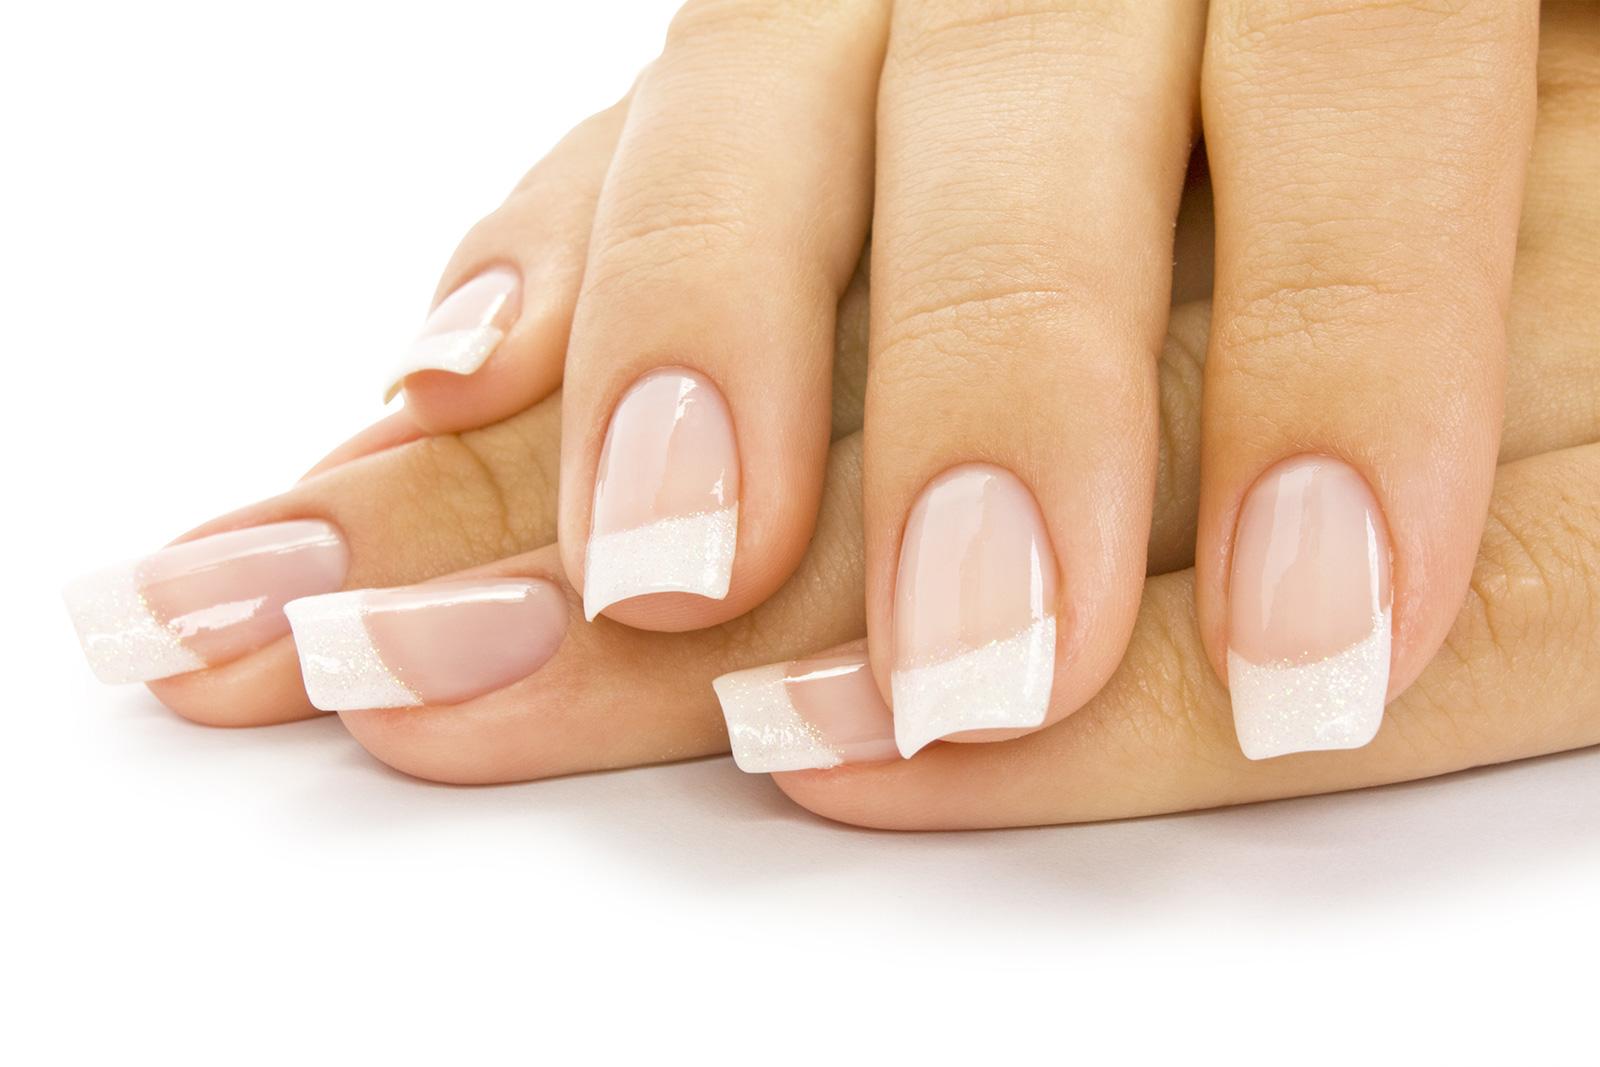 Nails funny